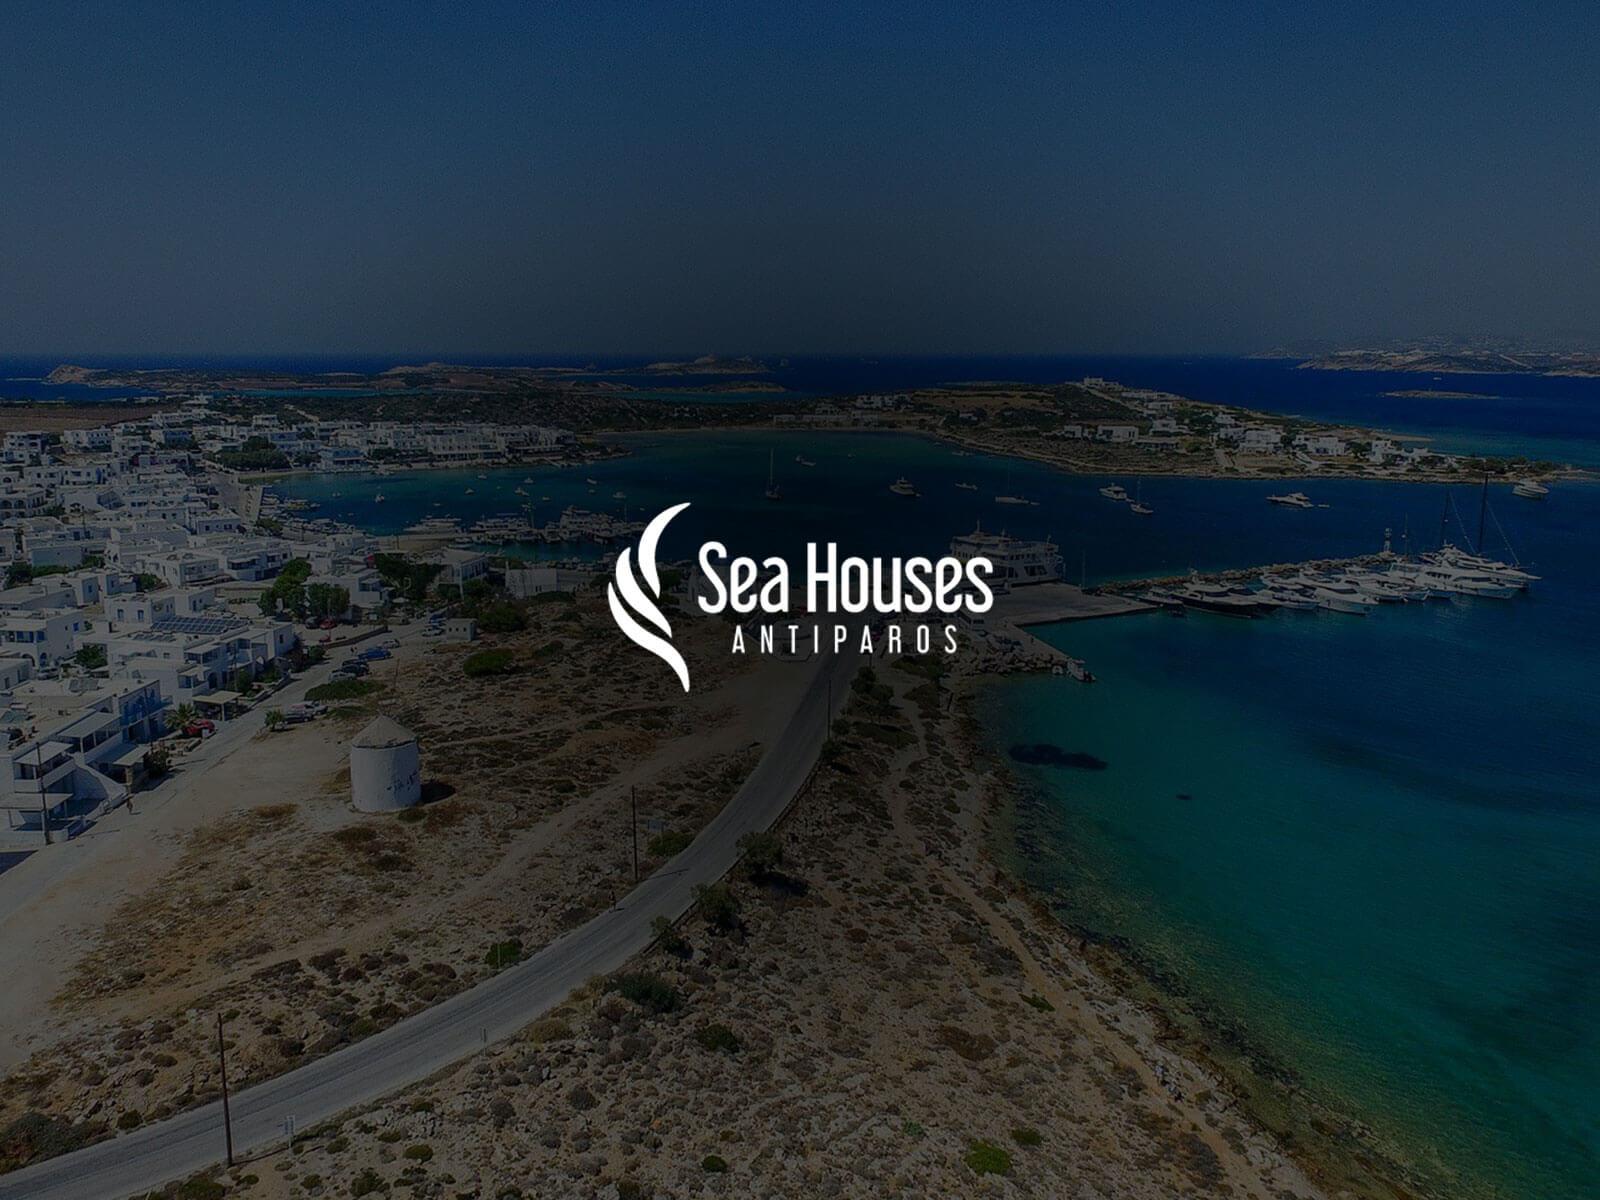 Sea Houses Antiparos